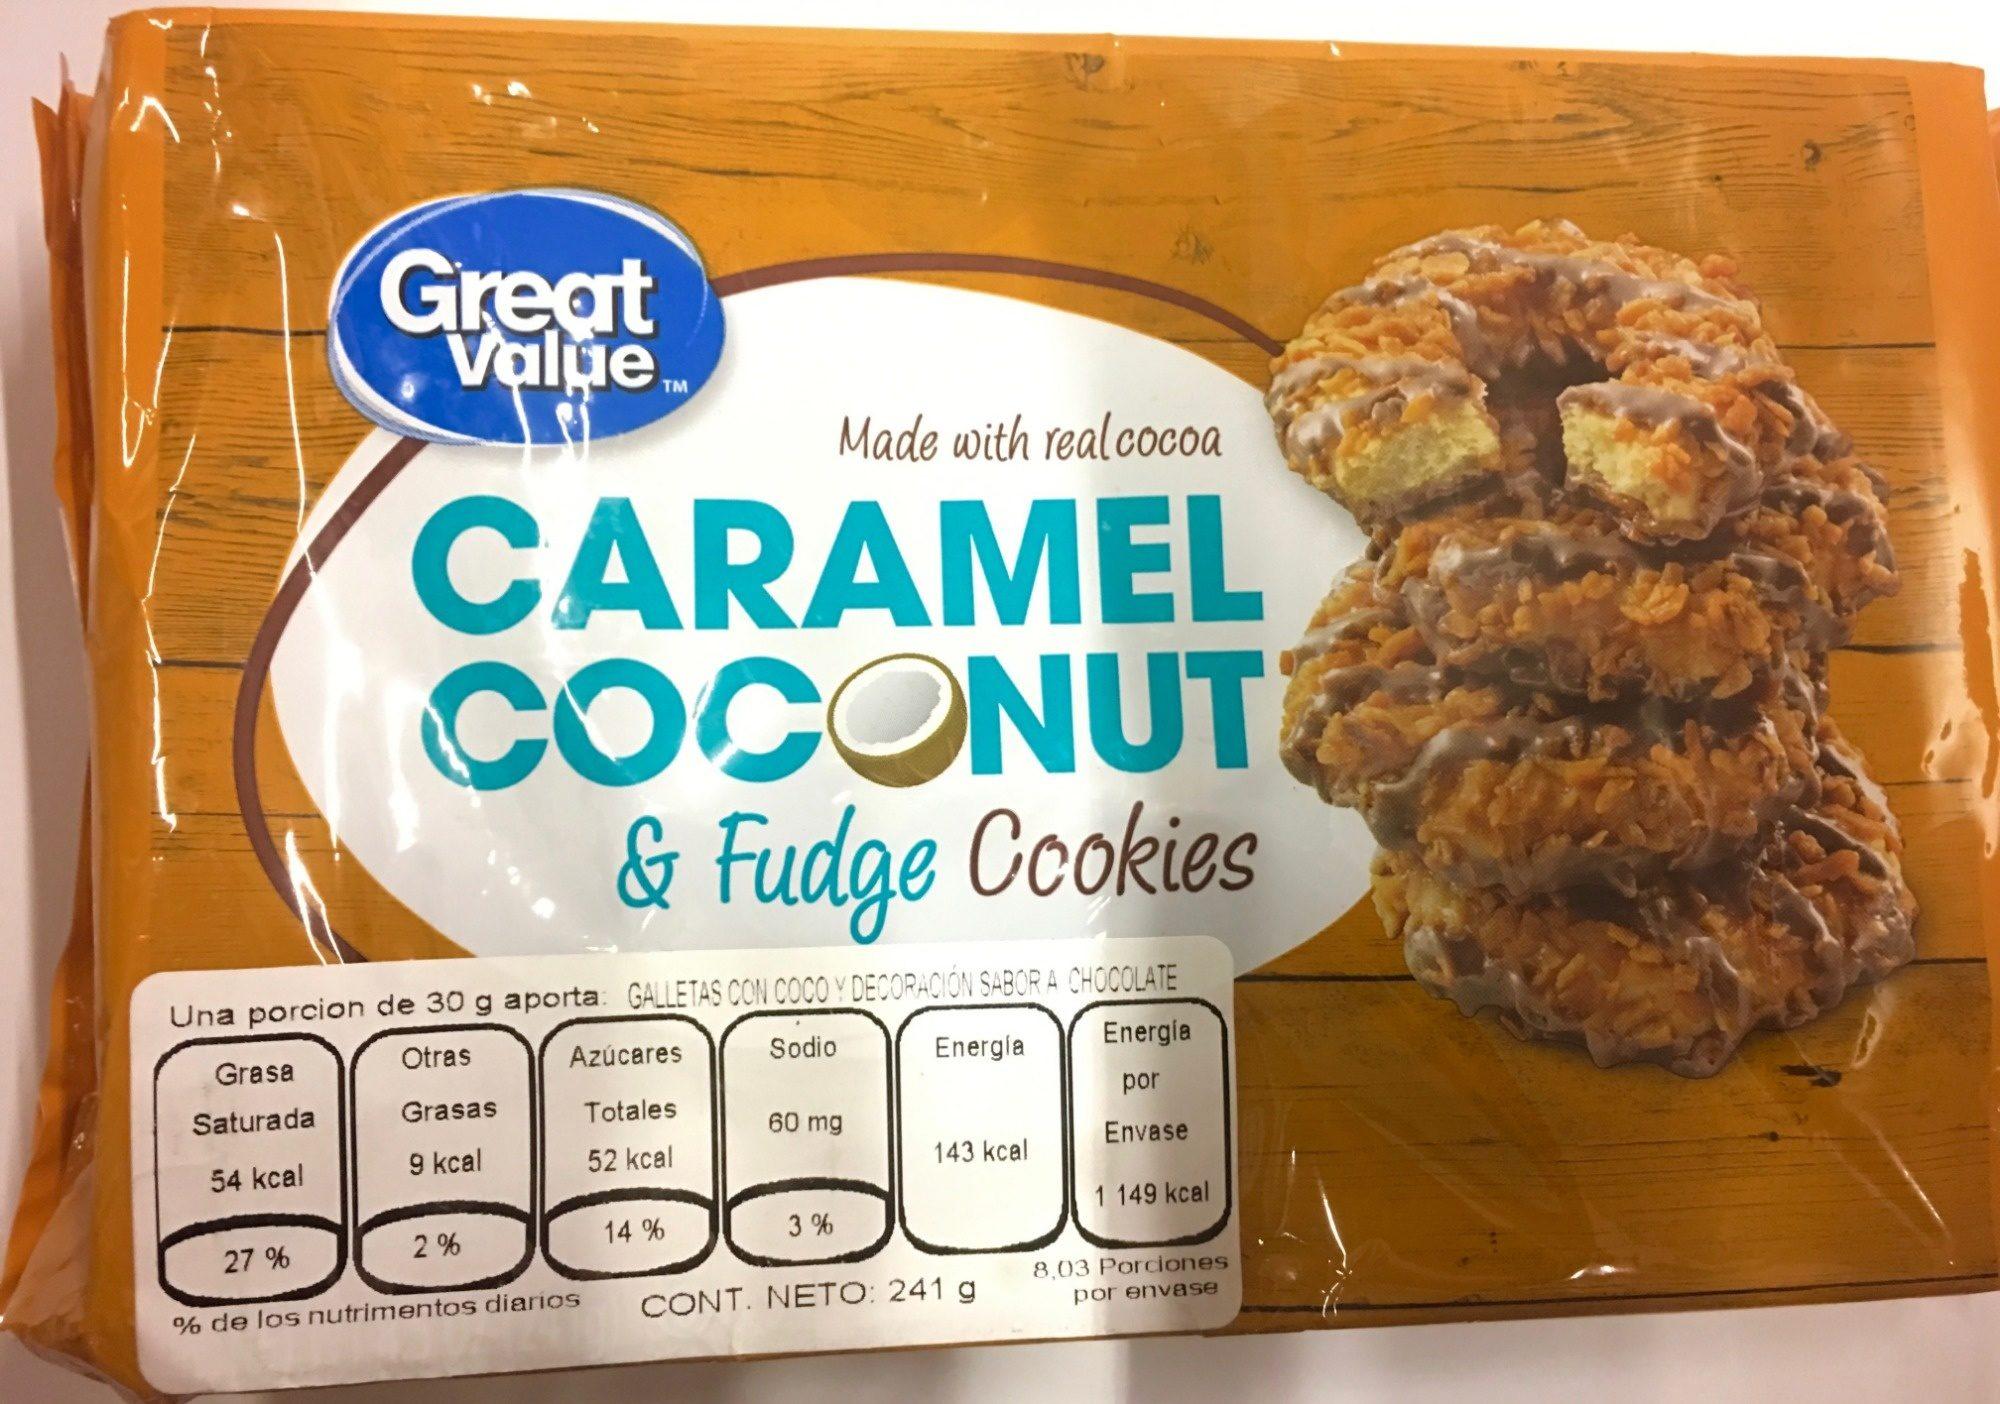 Caramel coconut & fudge cookies - Product - es